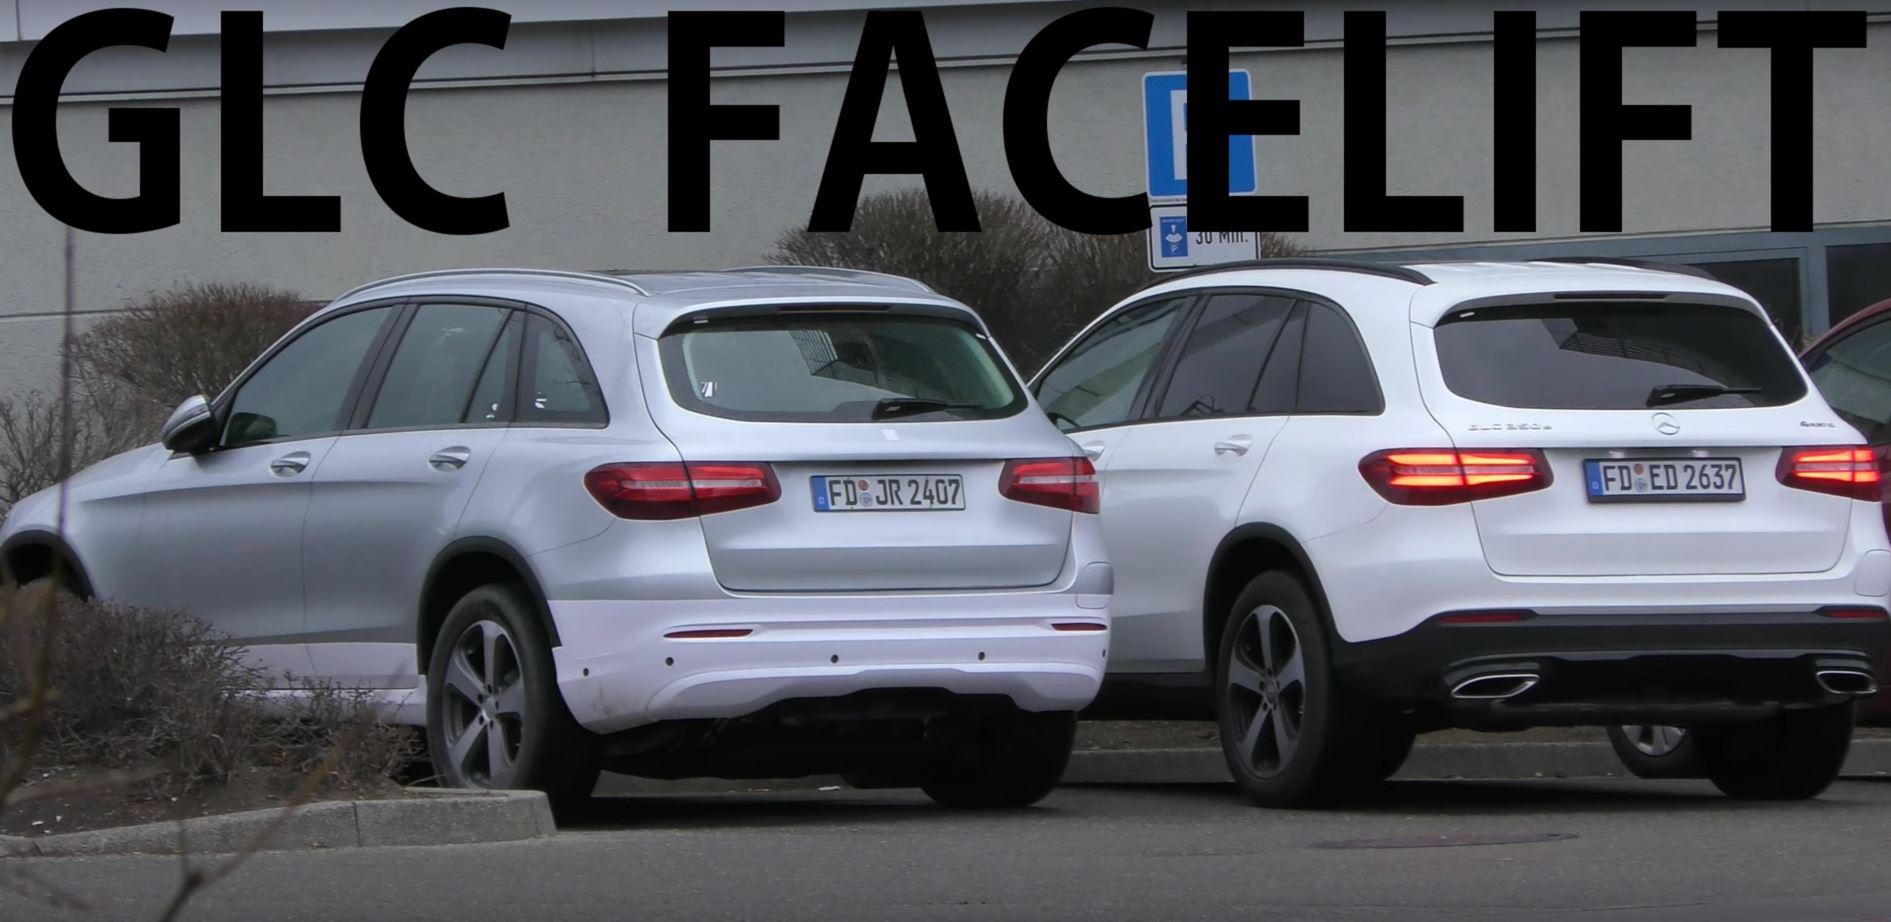 2019 Mercedes Slc >> Mercedes-Benz EQ Electric SUV Spied Next to GLC, Makes Weird Exhaust Smoke - autoevolution